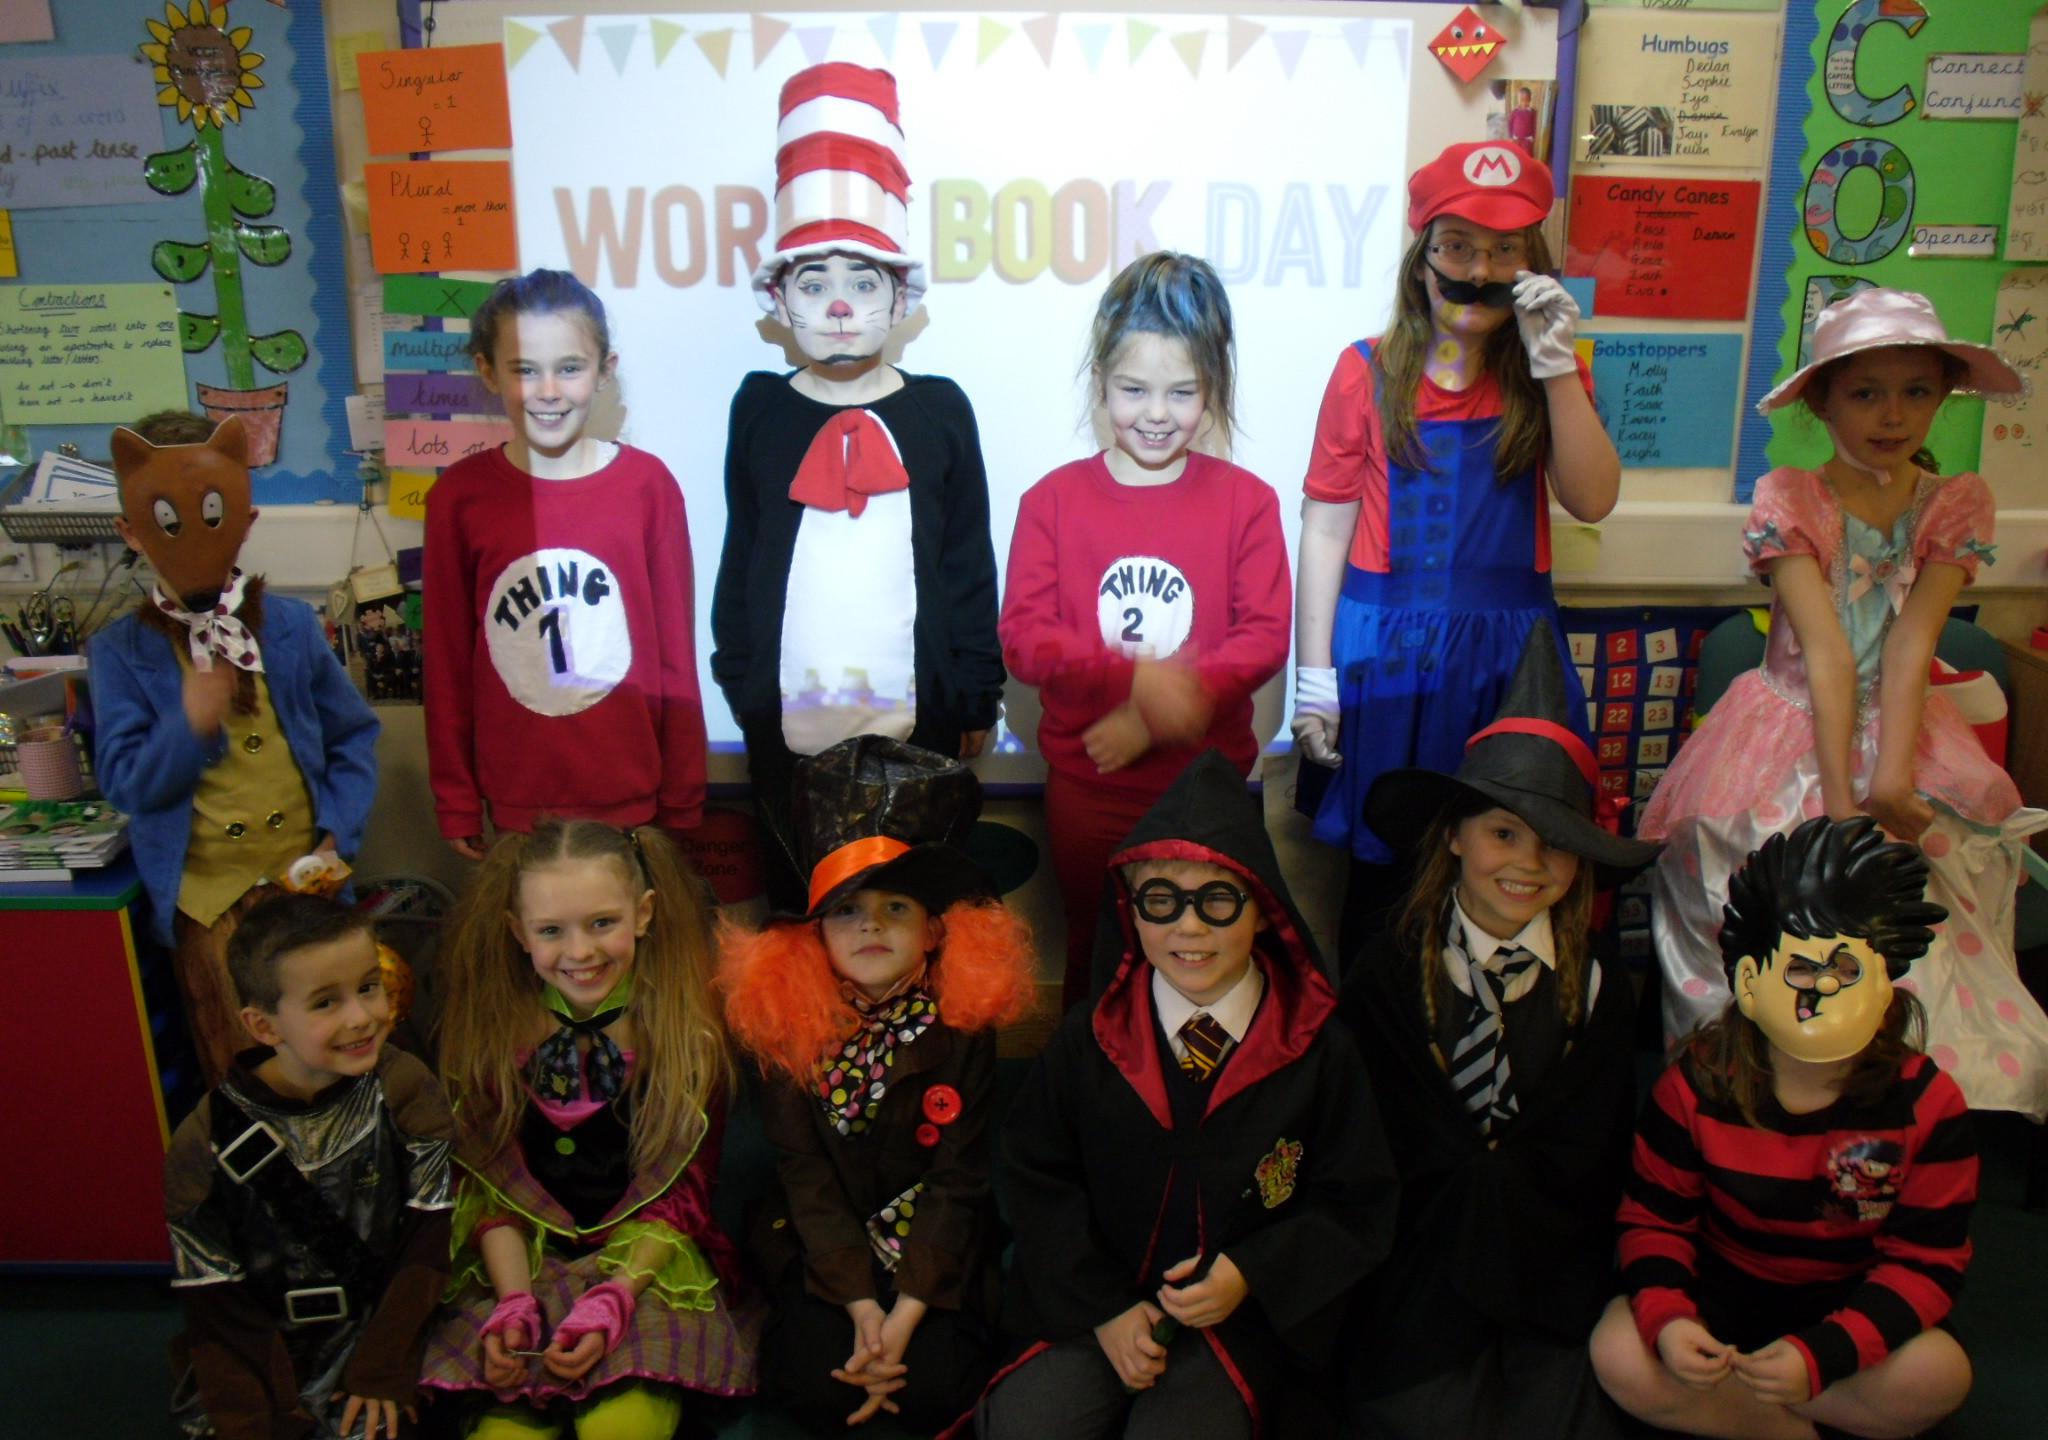 Conifers School World Book Day